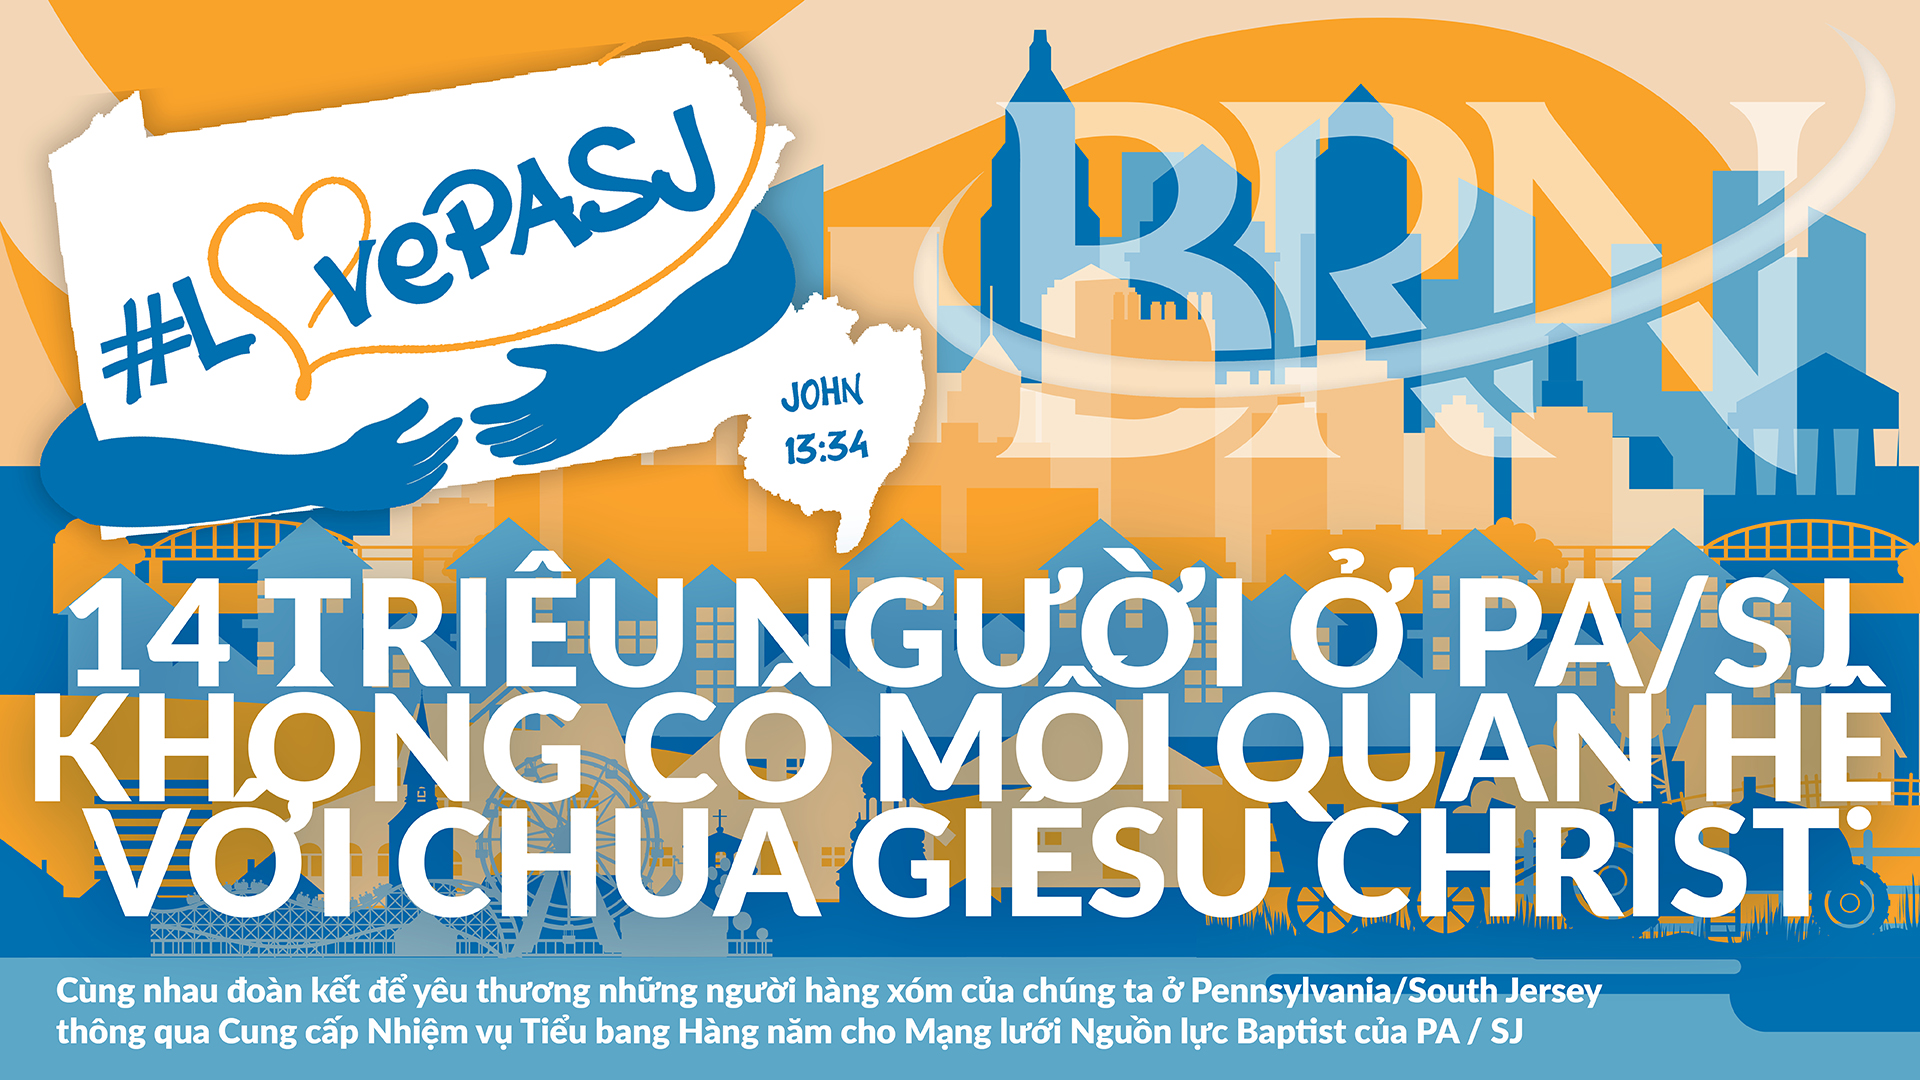 LovePASJ Slide 16x9 - Vietnamese